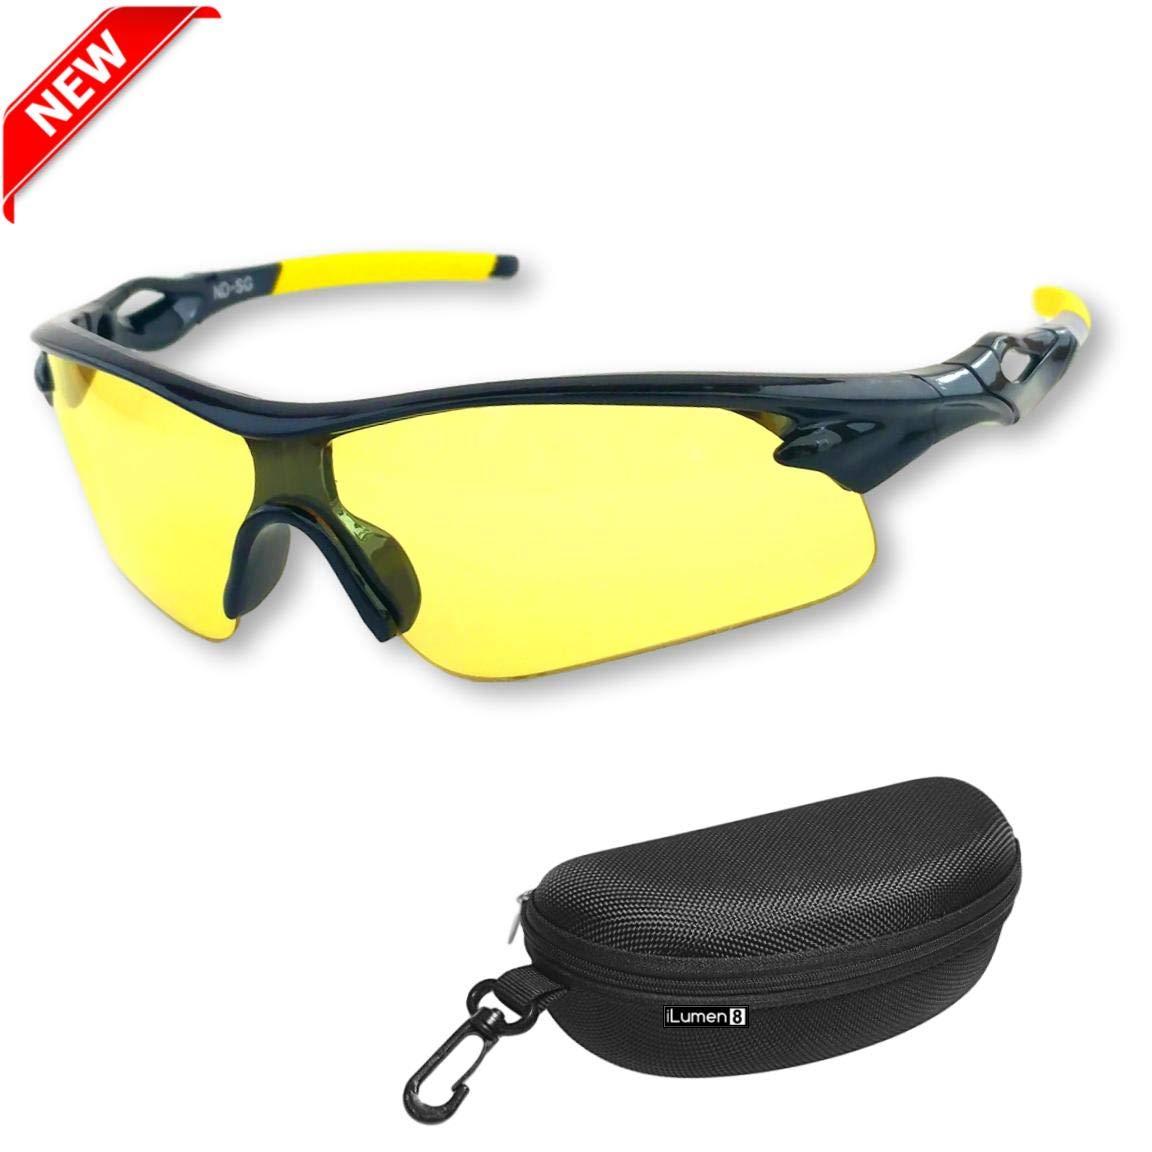 BEST Night Driving Glasses- Anti Glare Night Vision Reduce Eye Strain Golf Biking Riding Motorcycle